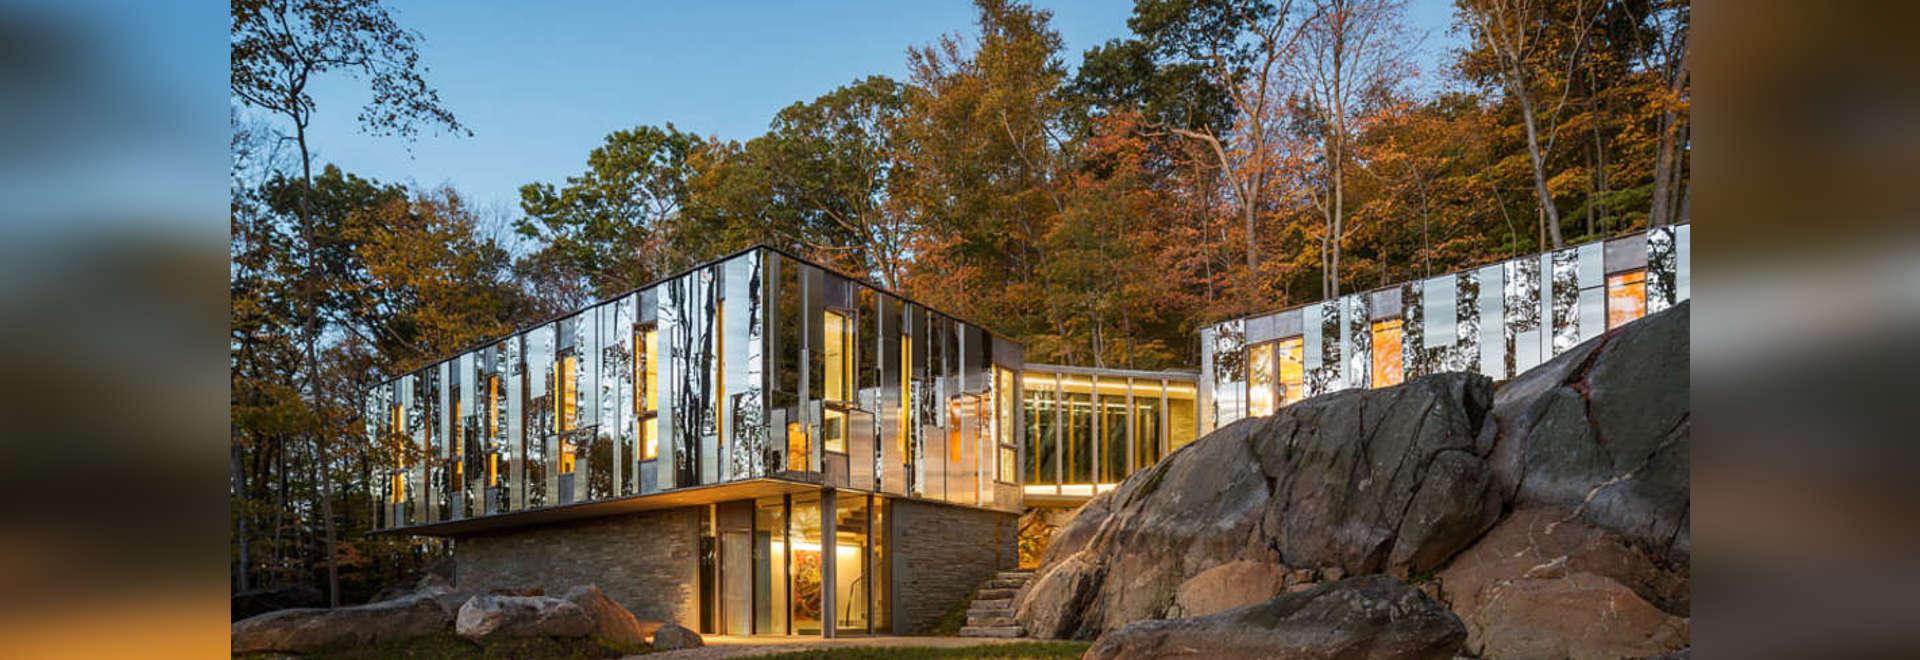 Pound Ridge House by KieranTimberlake, Pound Ridge, N.Y., United States